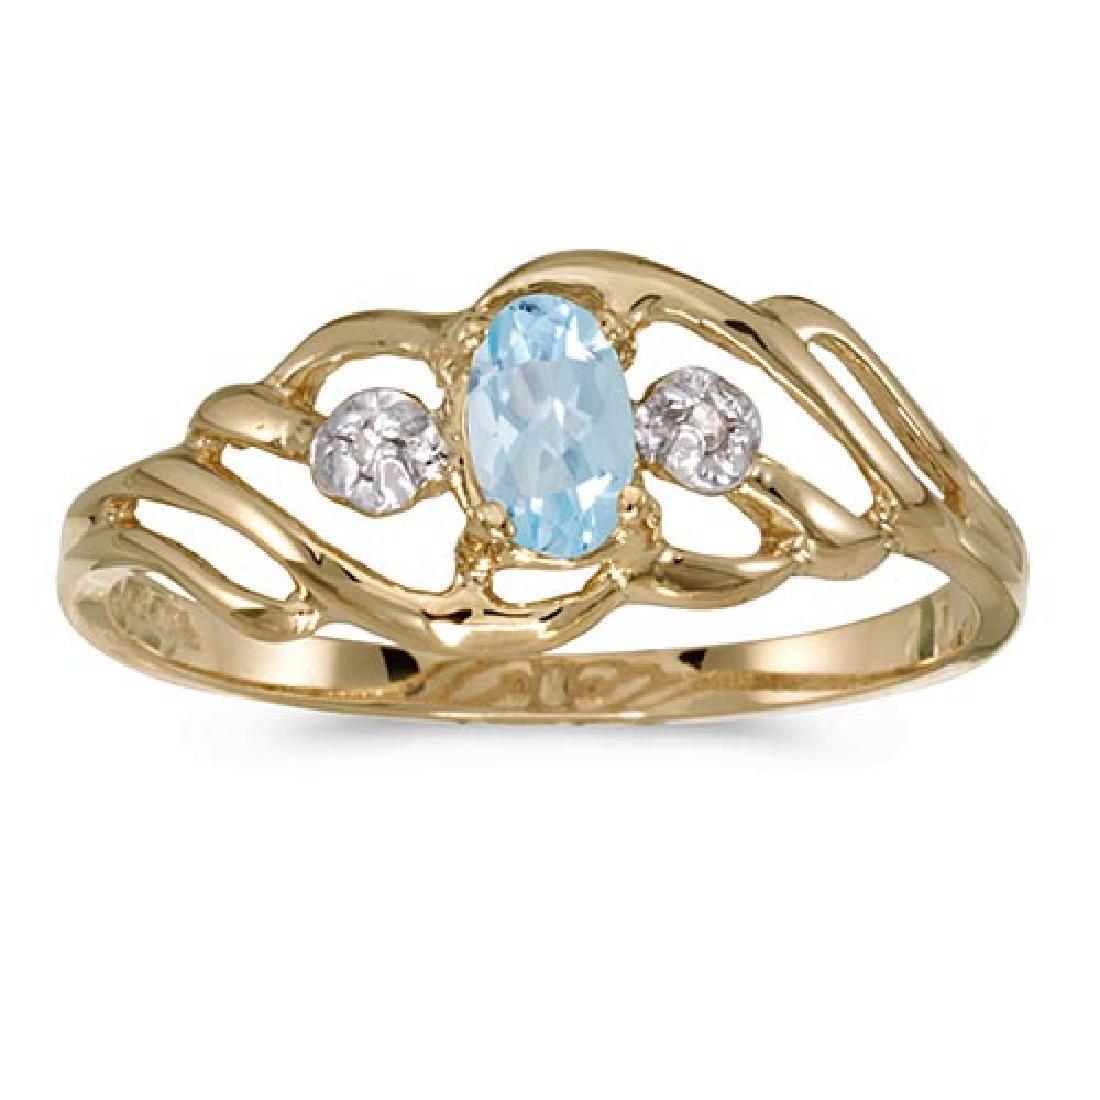 Certified 10k Yellow Gold Oval Aquamarine And Diamond R